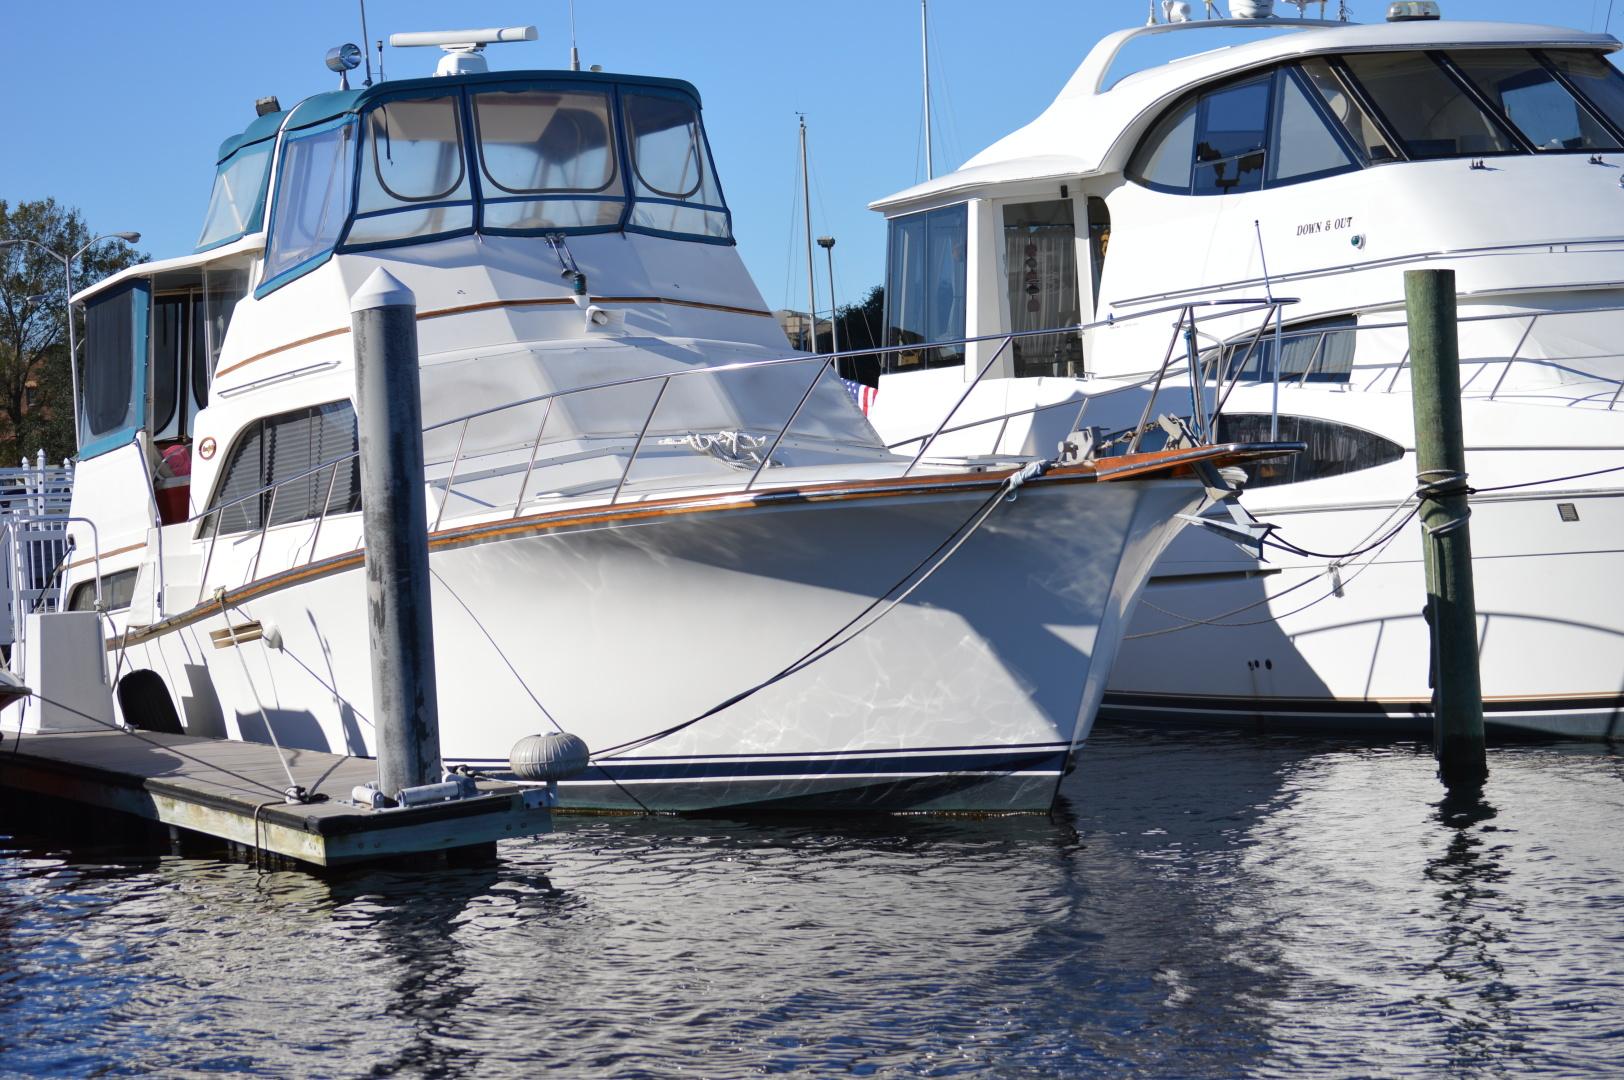 Ocean Yachts-46 Sunliner 1986-Sugah Portsmouth-Virginia-United States-1555479 | Thumbnail